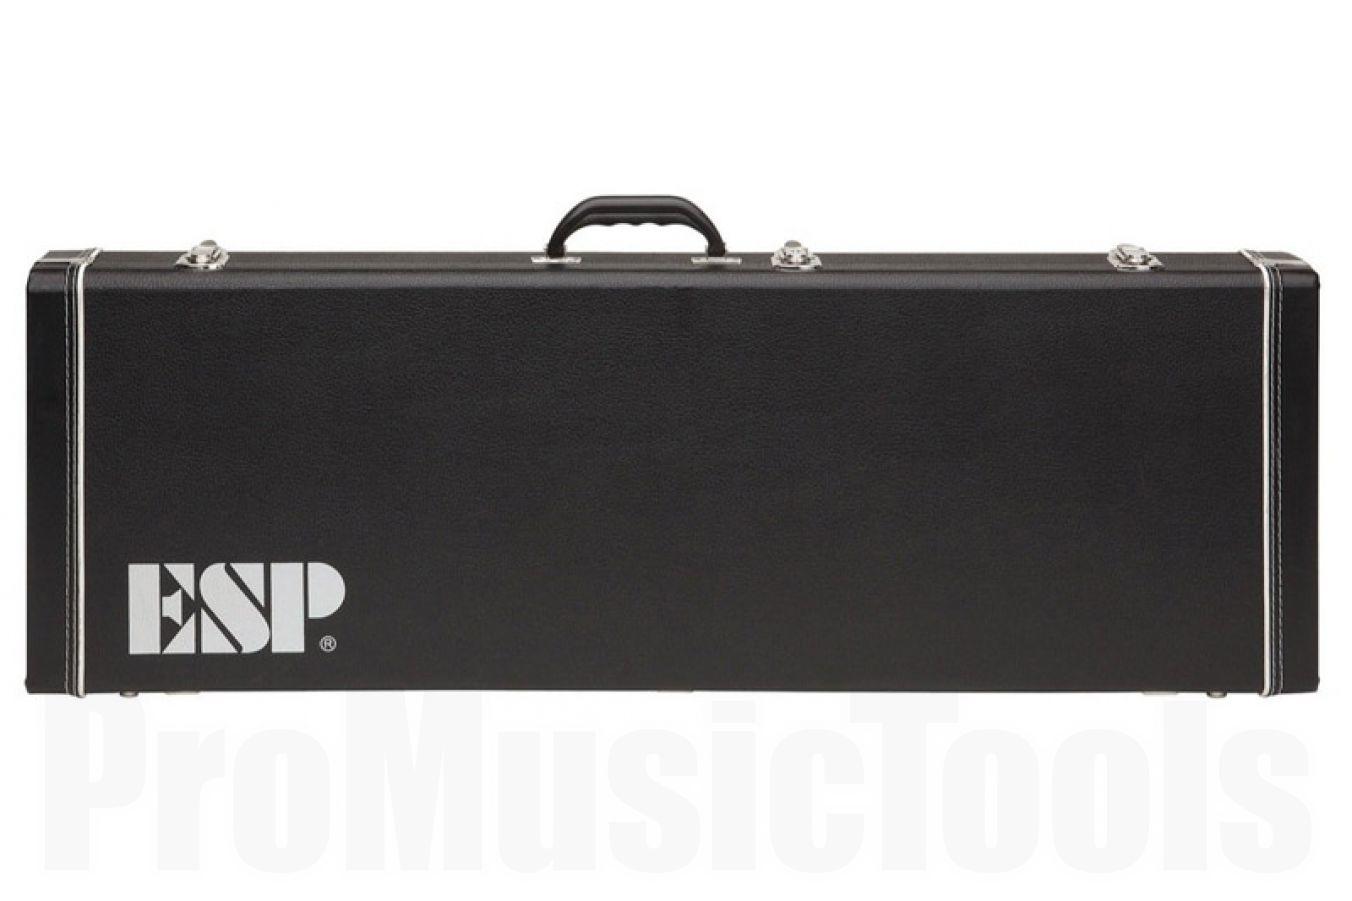 ESP Ltd ST / TE / Strat / Tele Series guitar hardcase